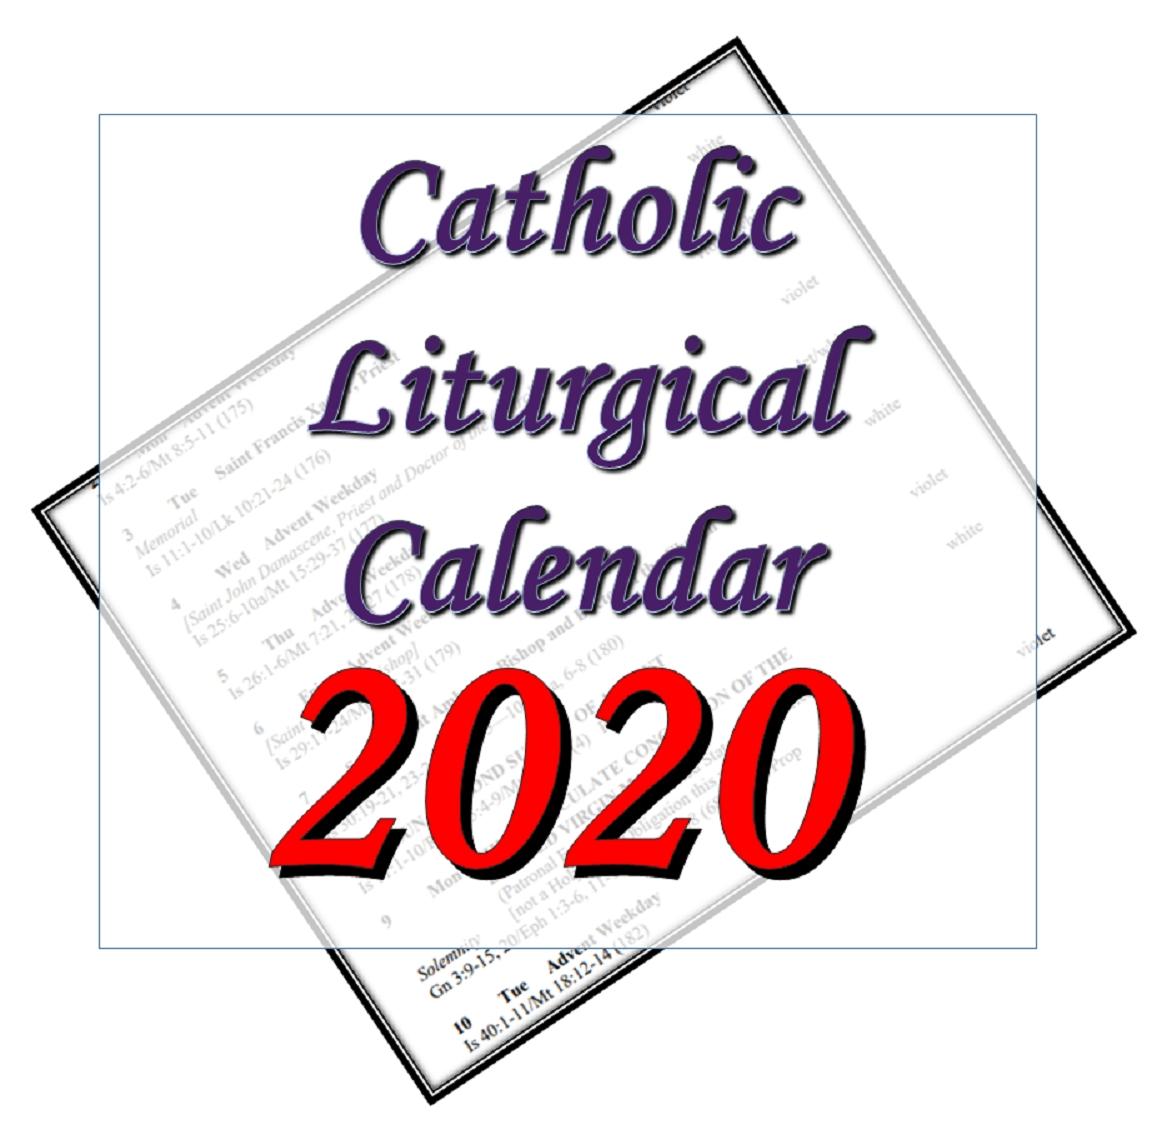 Liturgytools: Catholic Liturgical Calendars For 2020 intended for Printable Catholic Liturgical Calendar 2019 2020